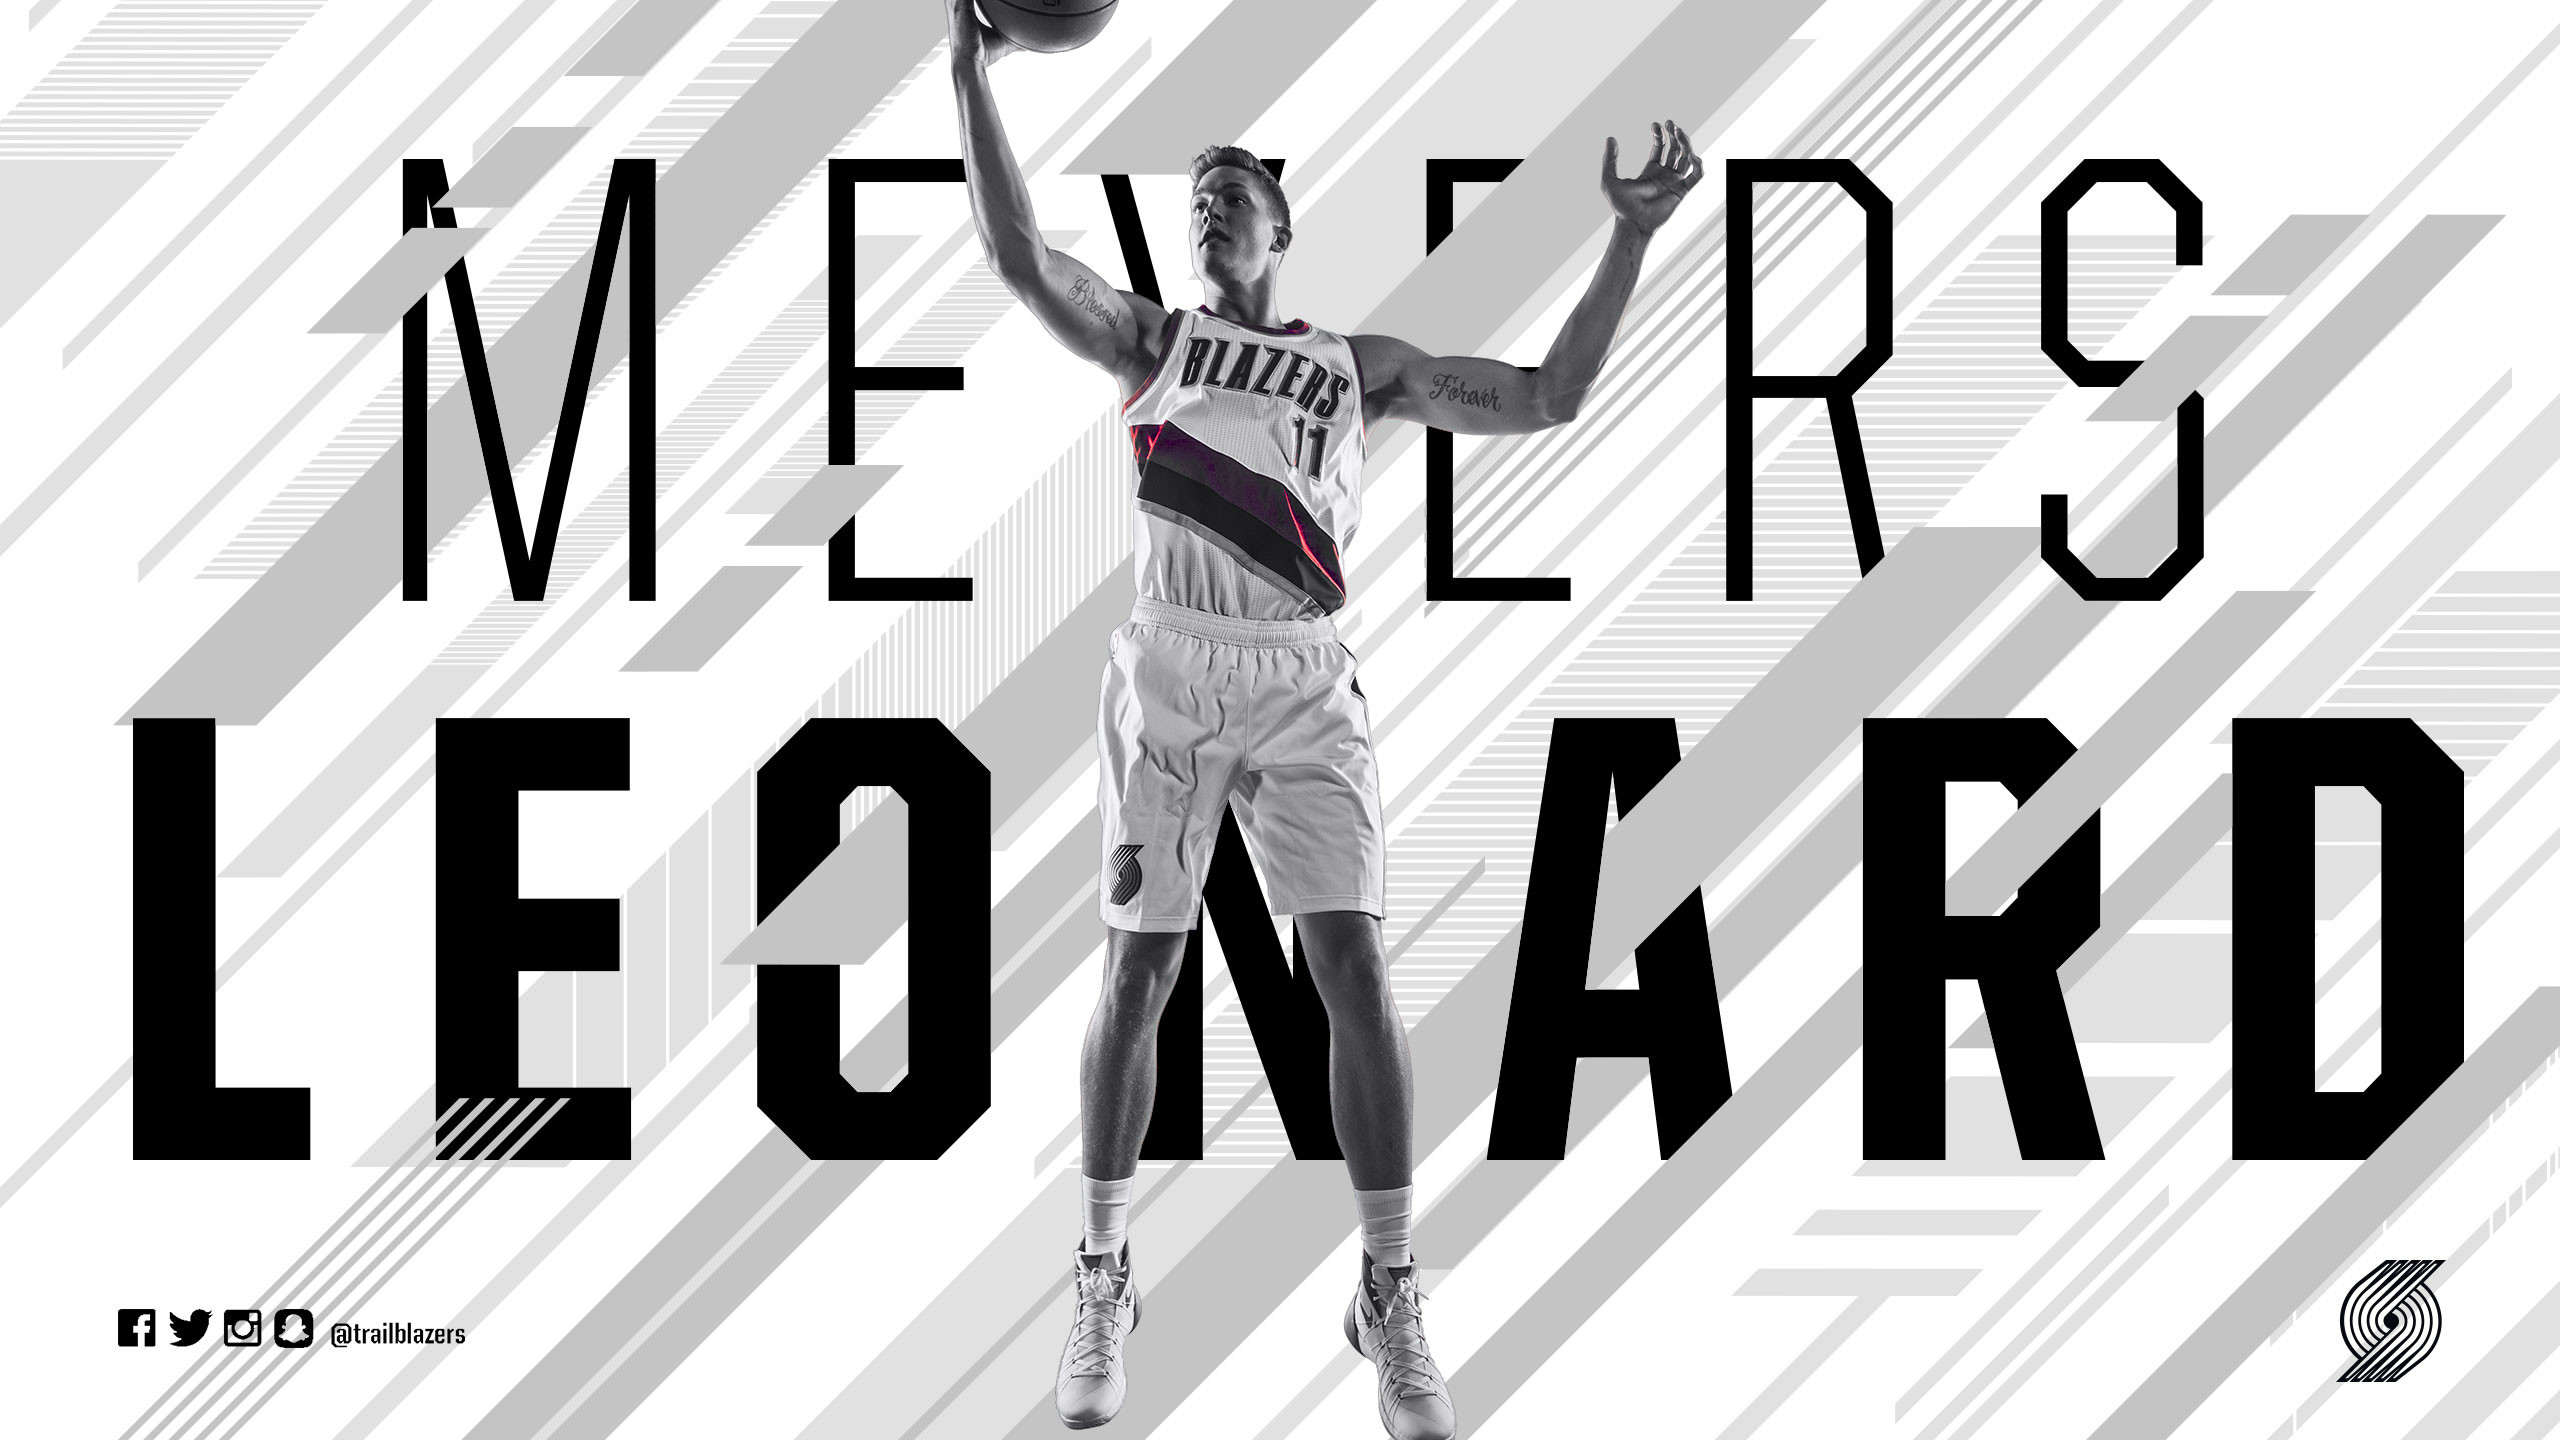 February 2016 / Meyers Leonard